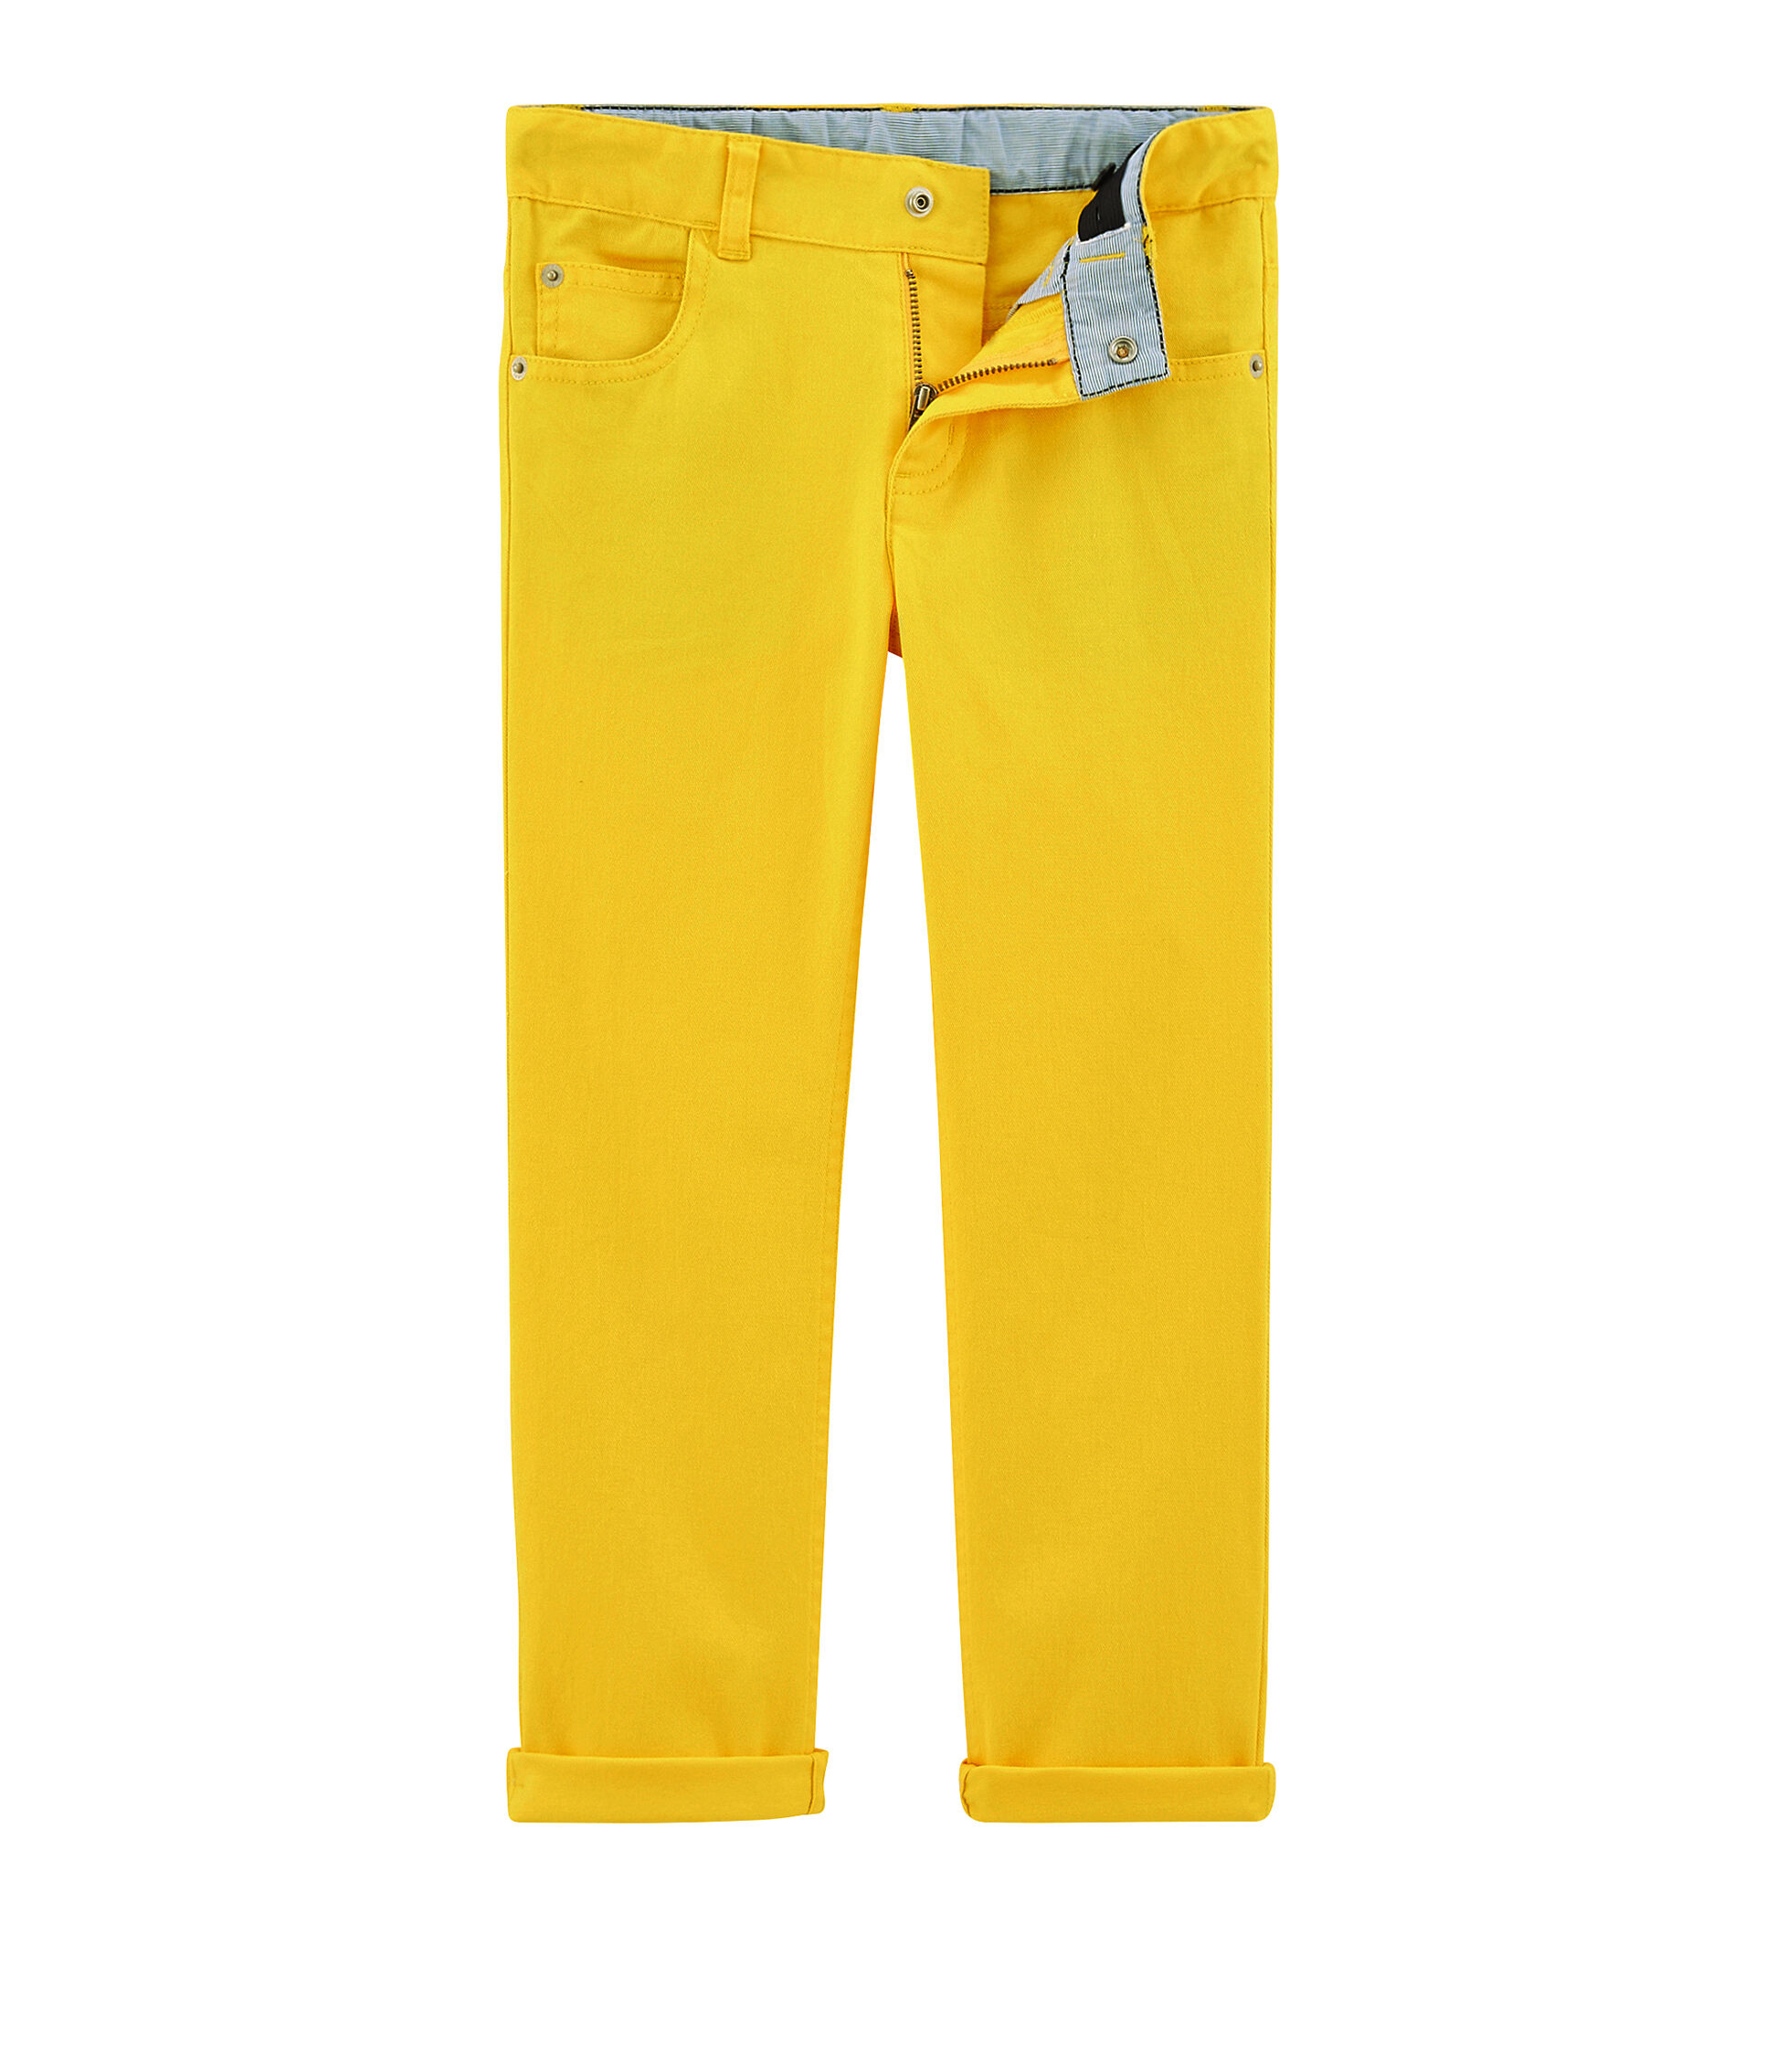 Enfant Pantalon GarçonPetit Bateau Pantalon Enfant Nn0m8w